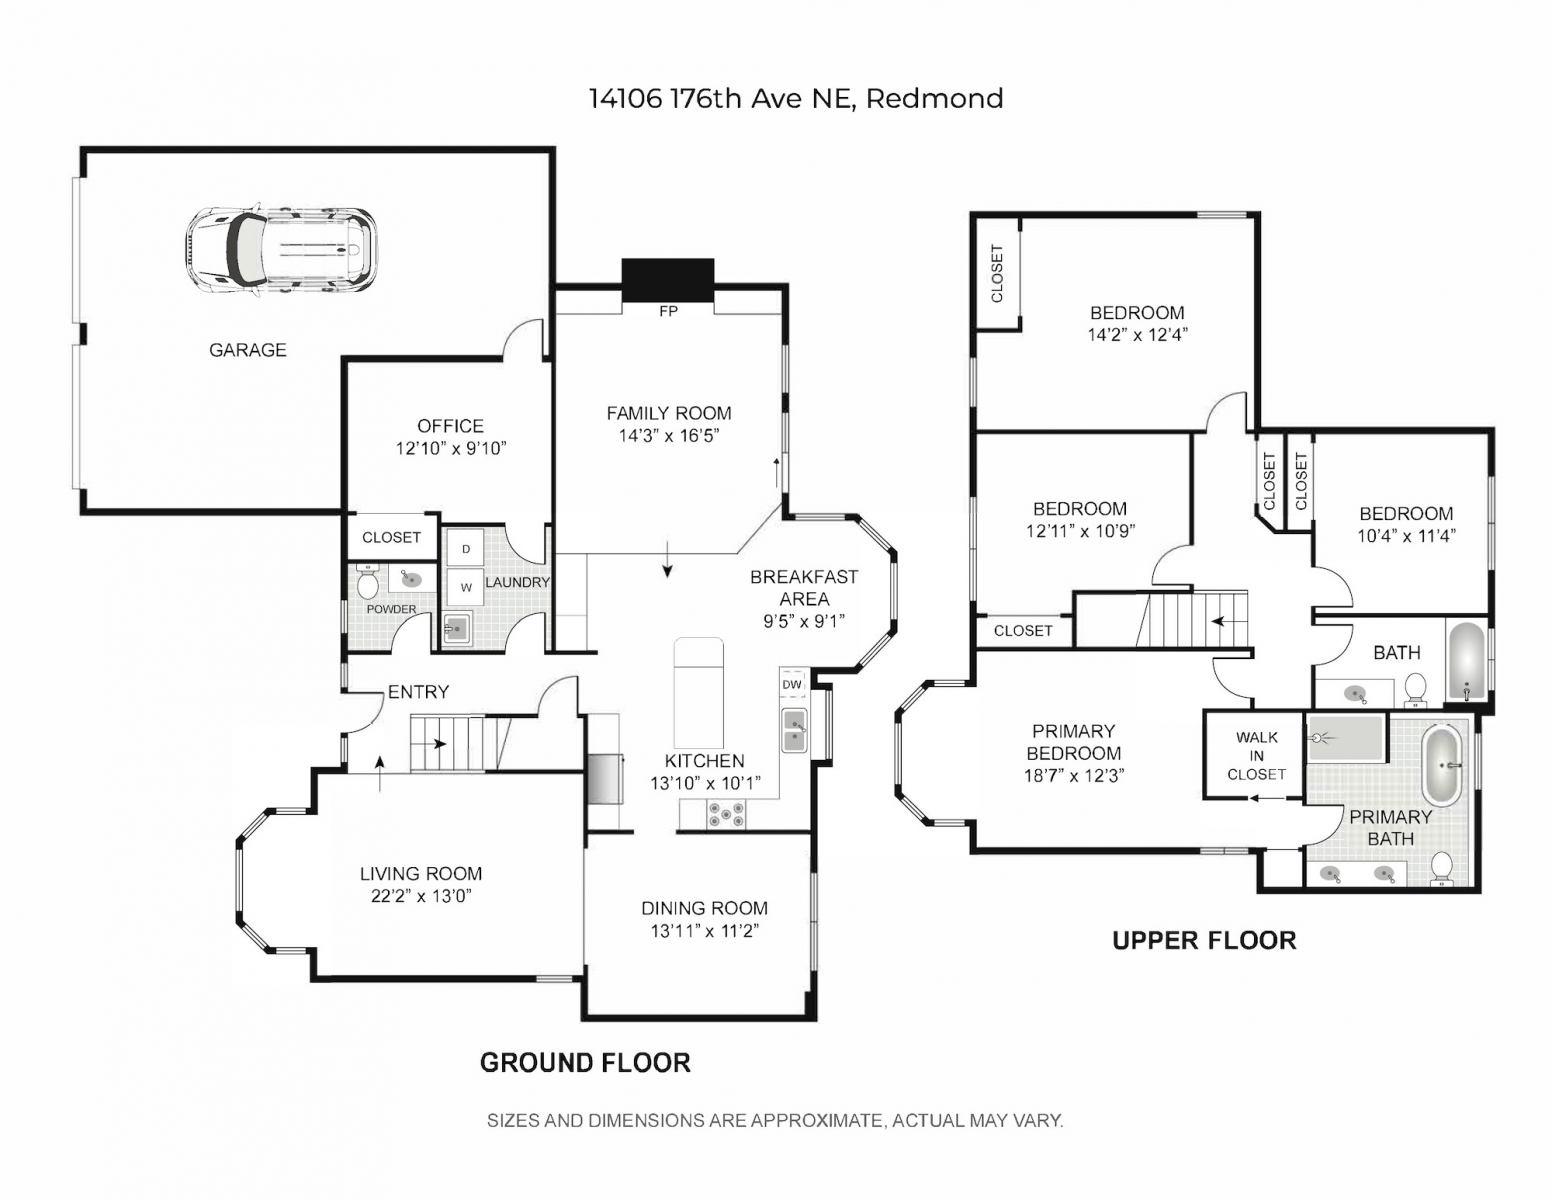 14106-176th-Ave-NE-Redmond-Floorplan